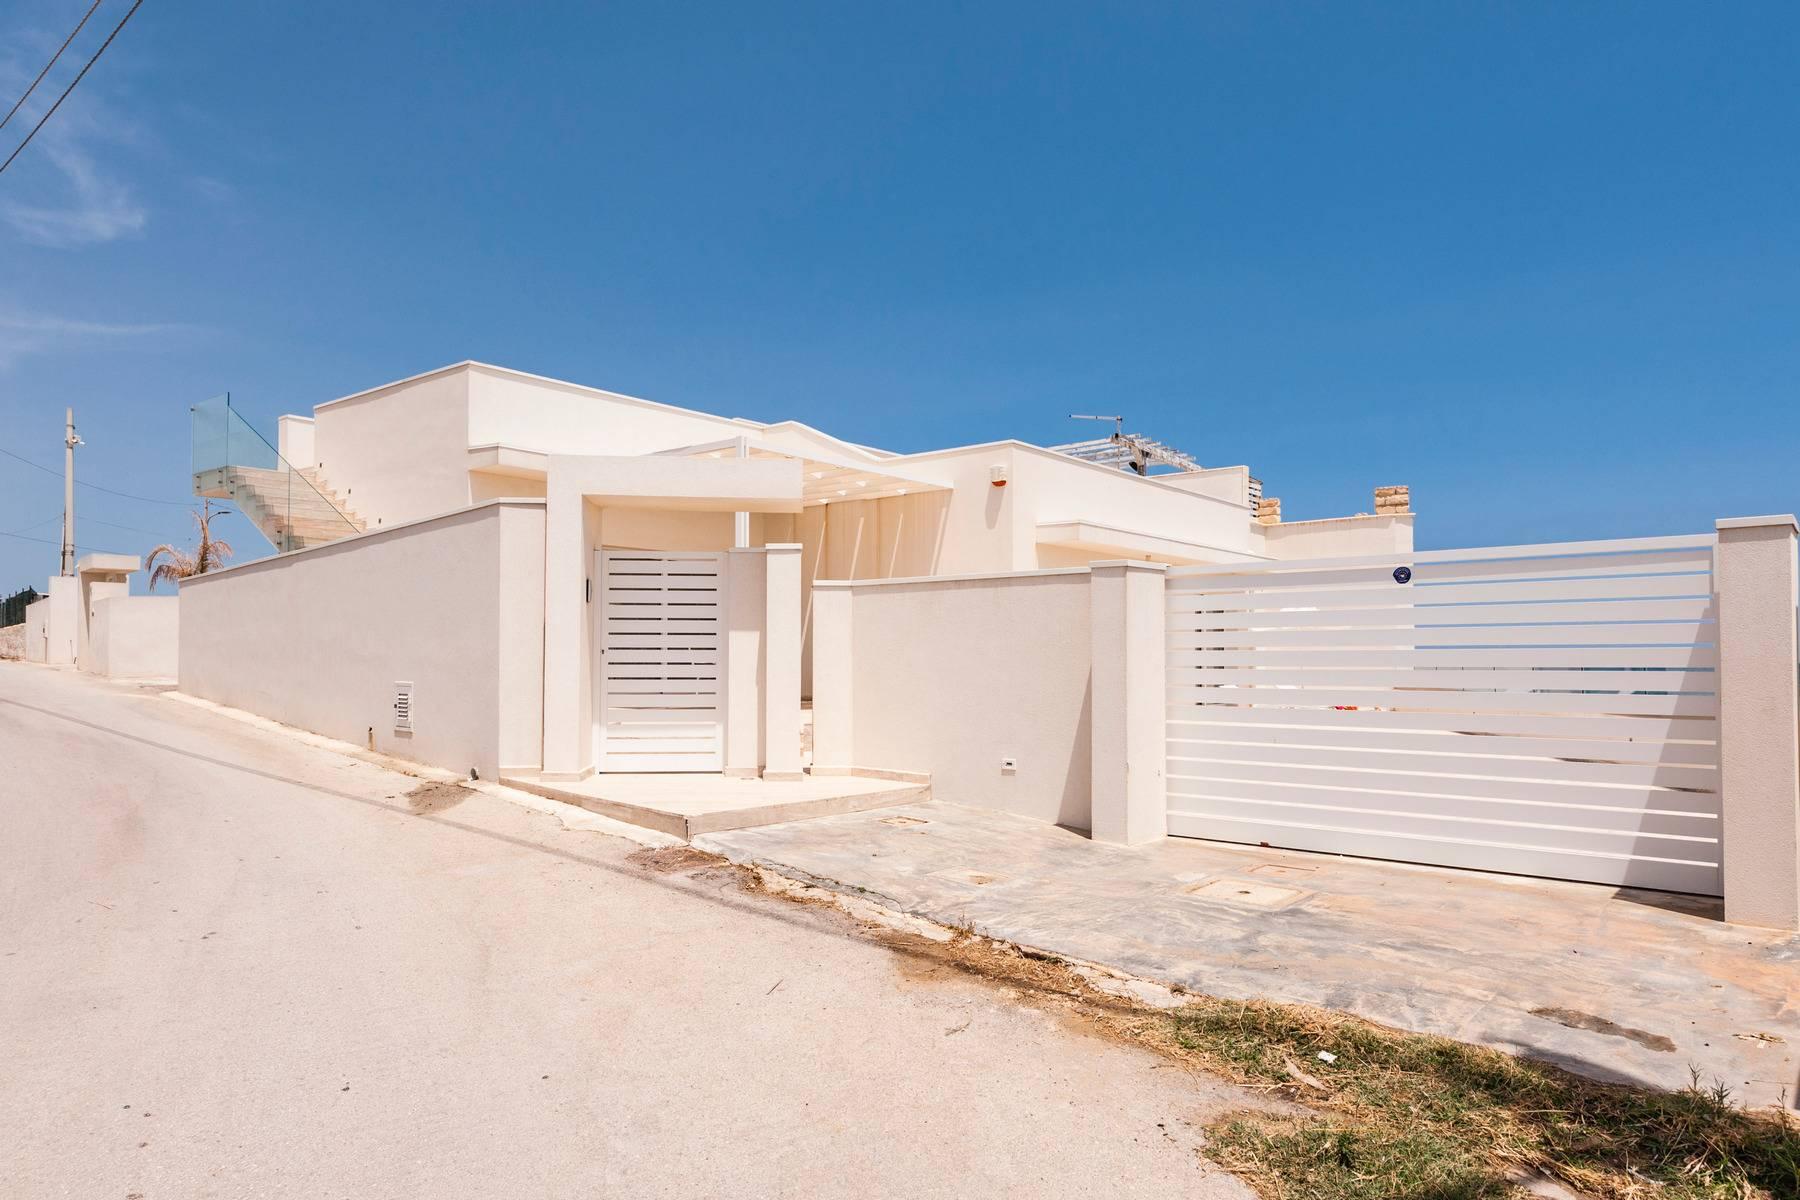 Casa indipendente in Vendita a Avola: 5 locali, 131 mq - Foto 17